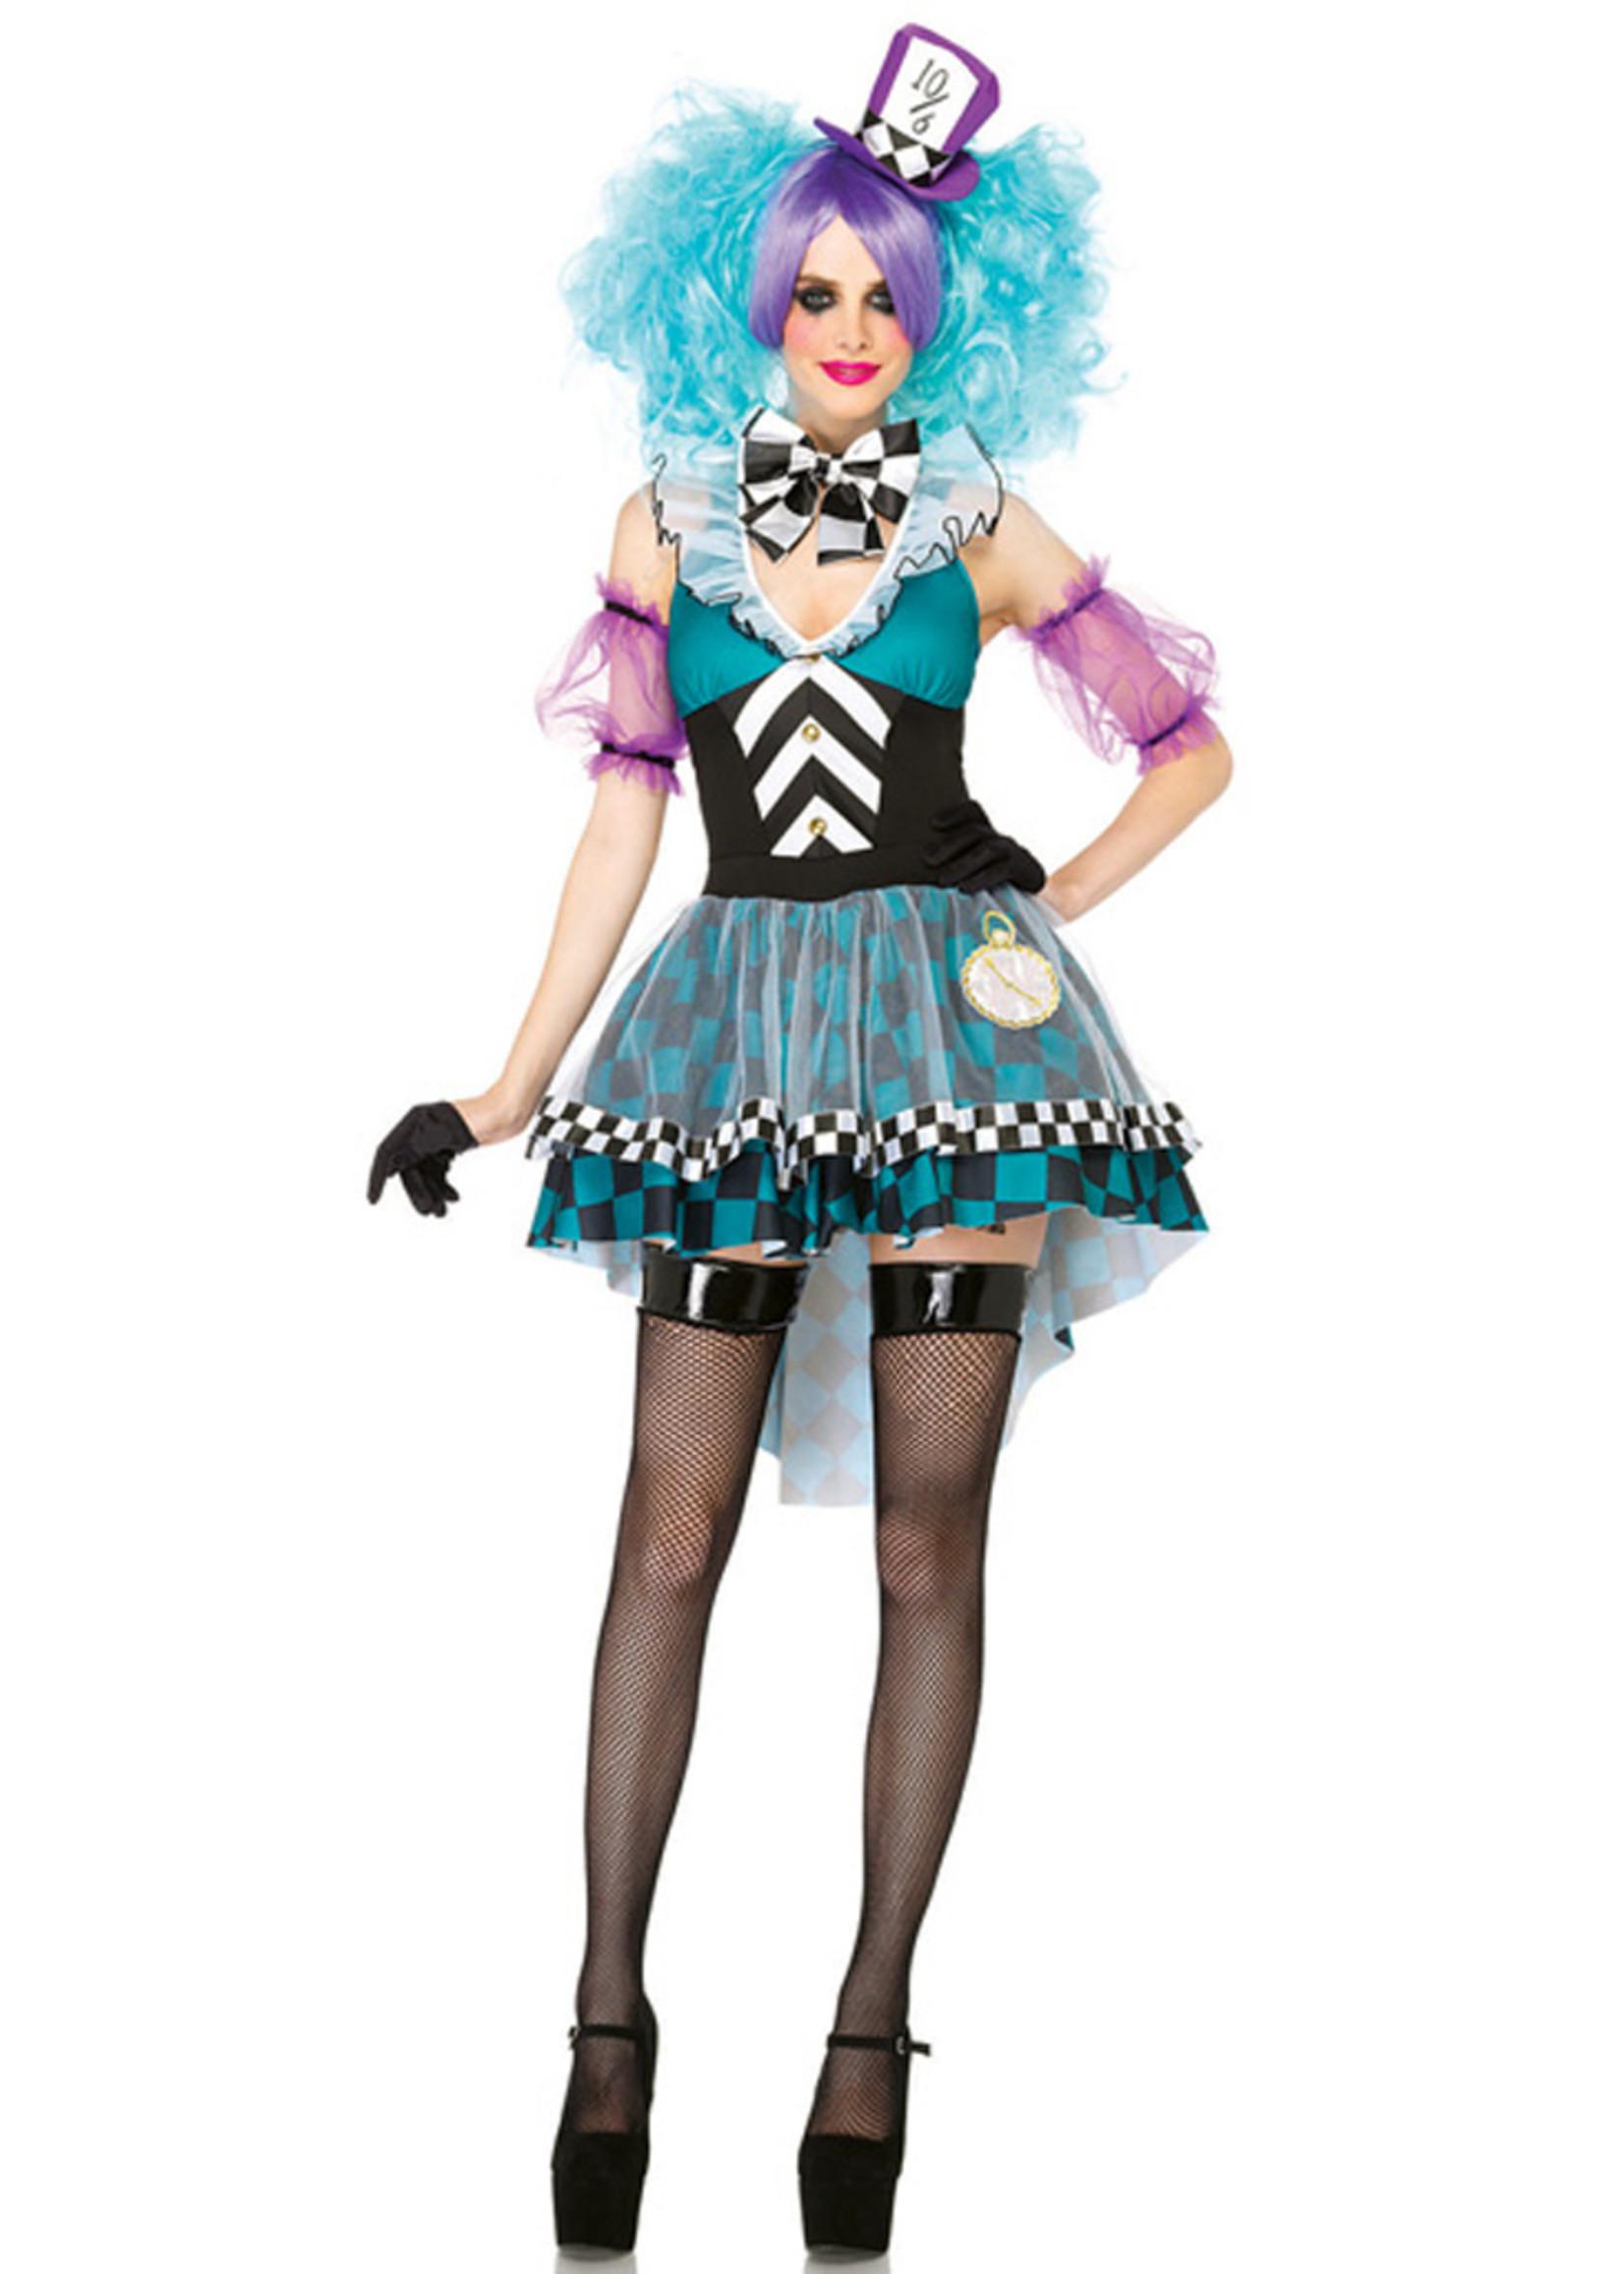 Manic Mad Hatter Costume - Women's